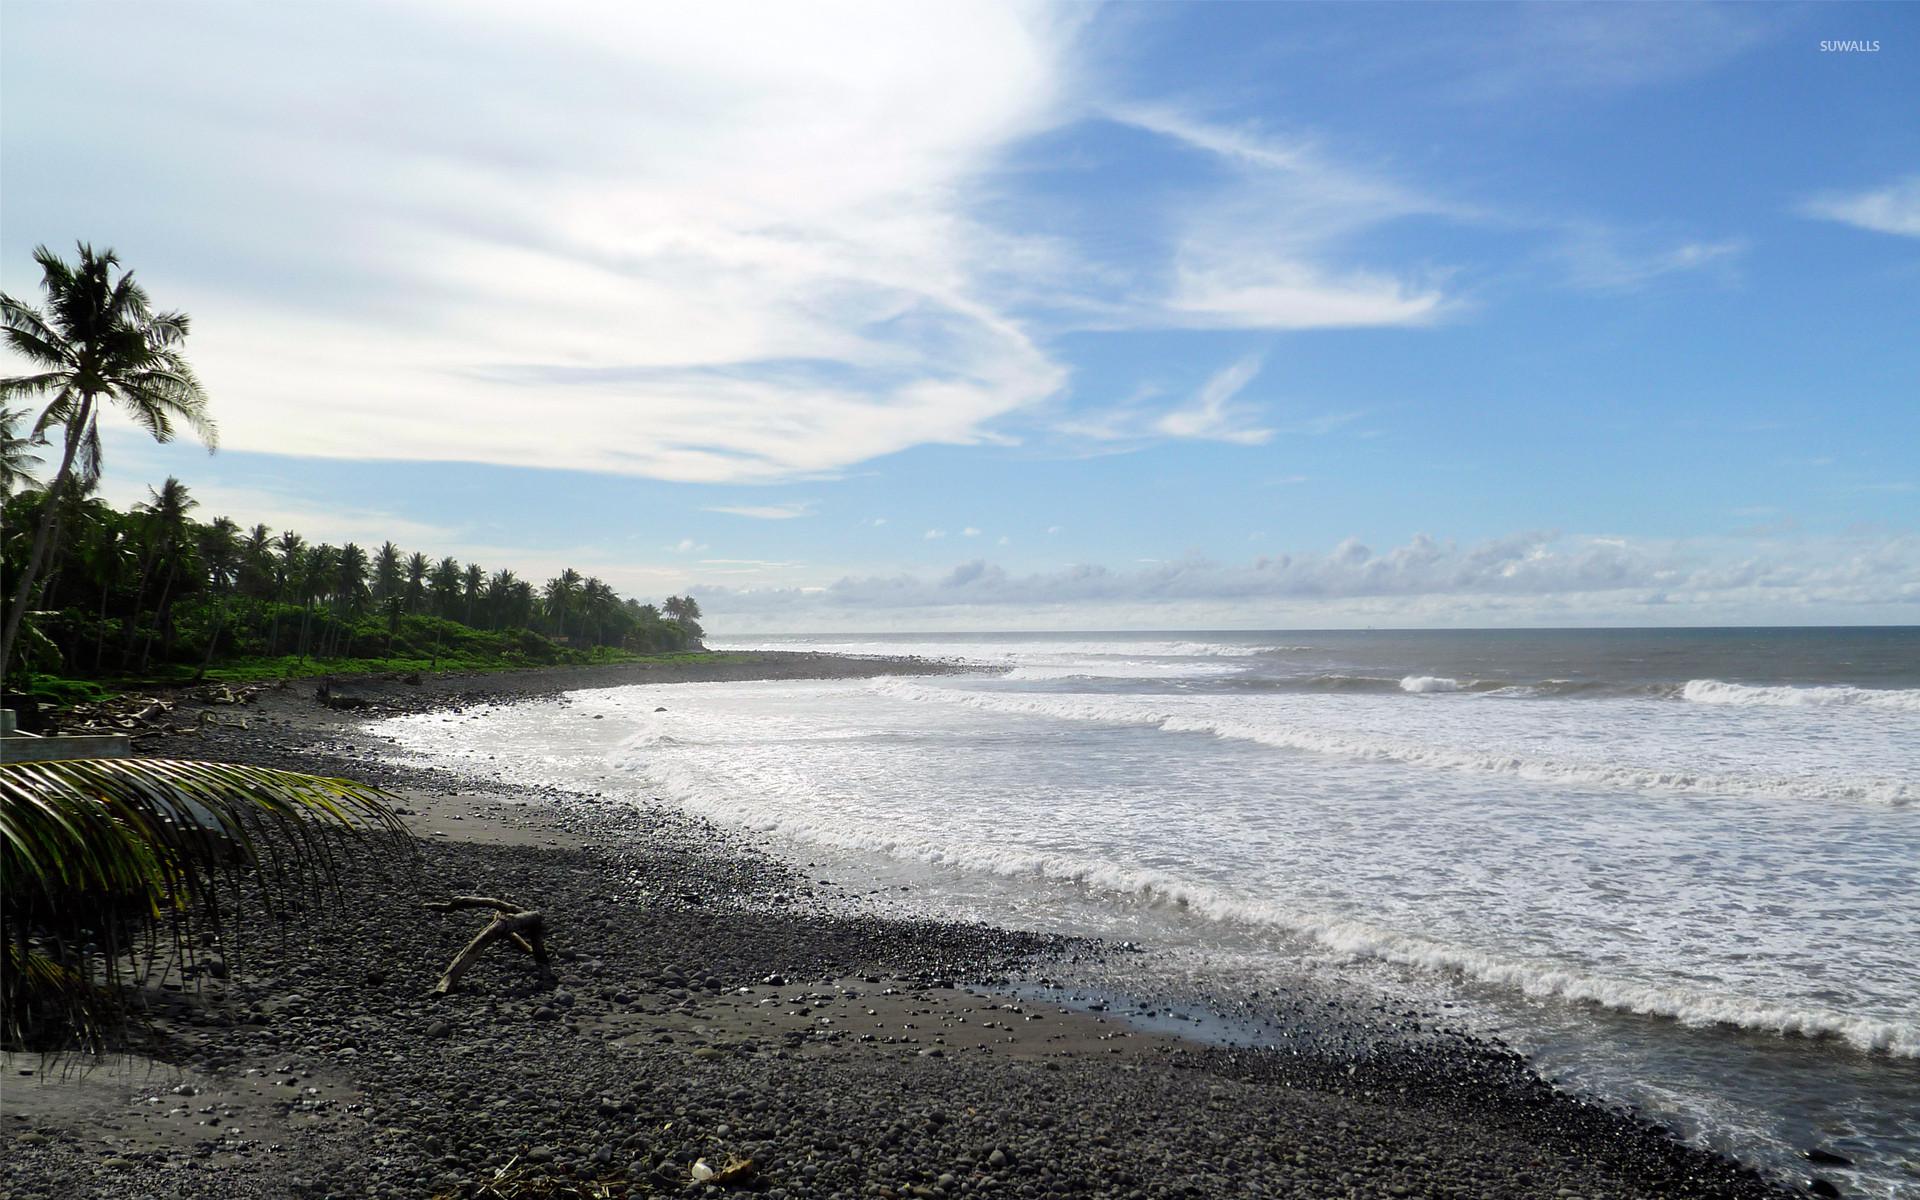 Res: 1920x1200, Pebble beach at the ocean wallpaper